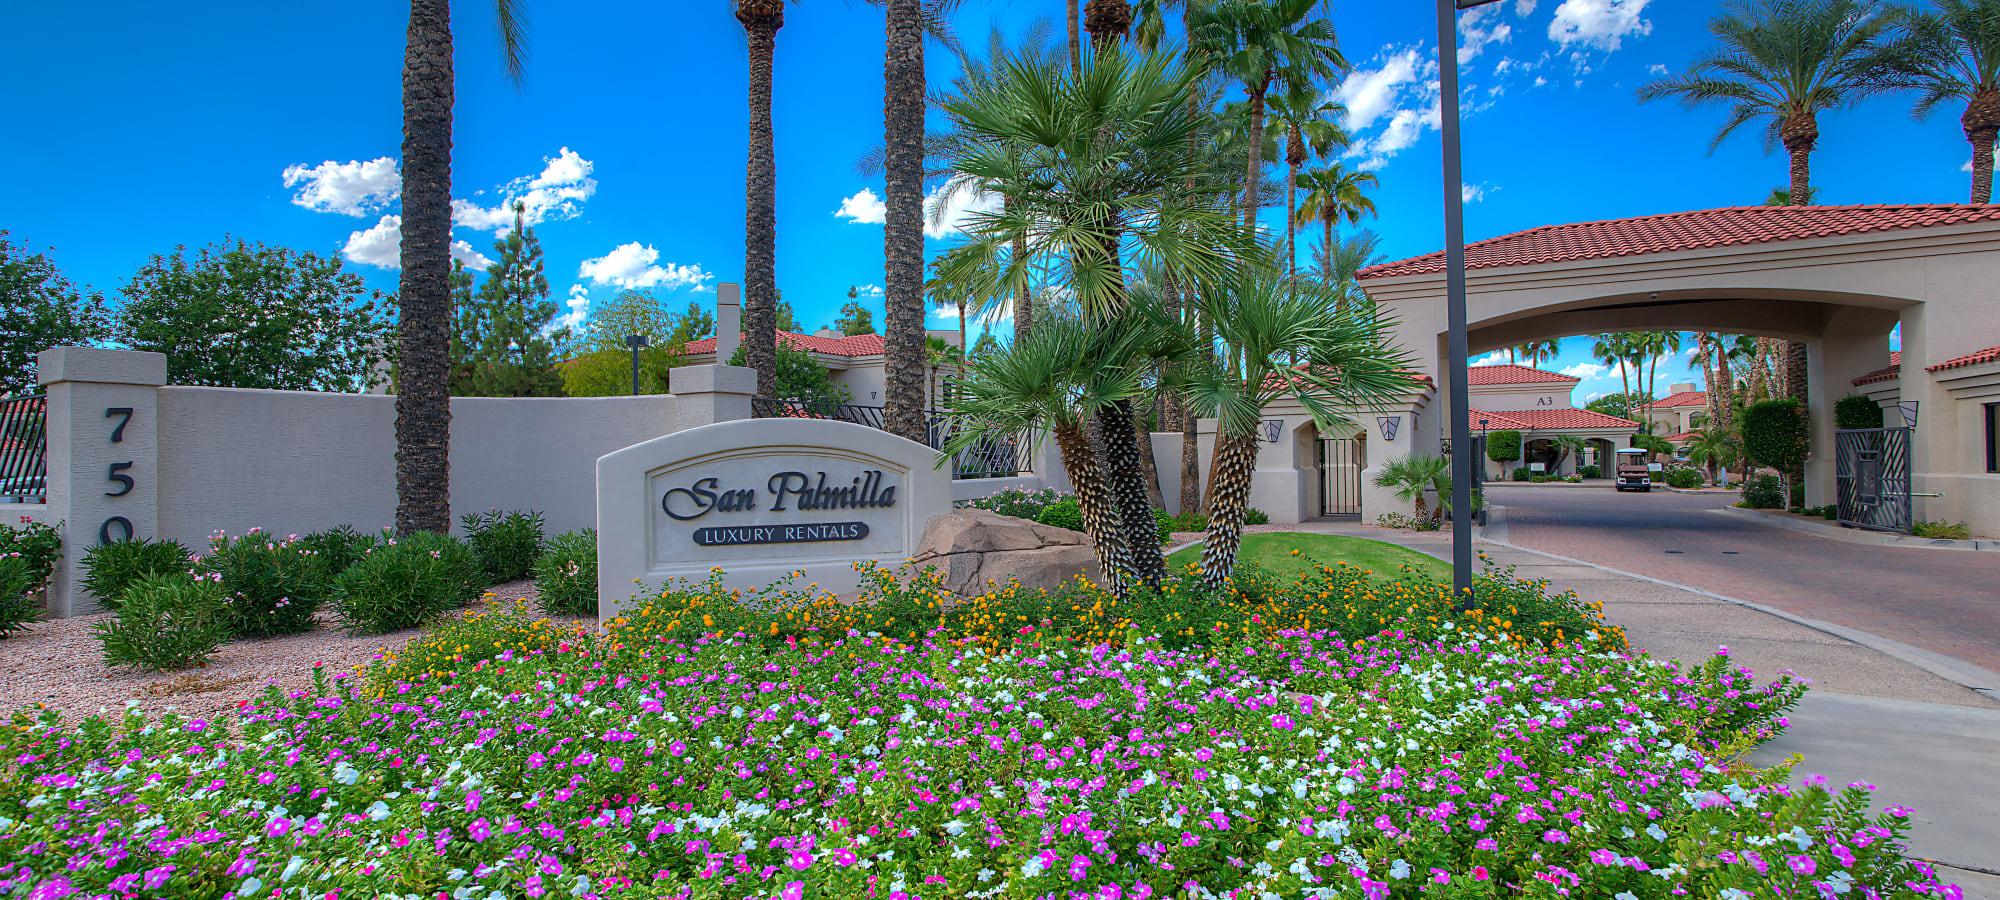 Beautiful flower garden approaching the gated entrance to San Palmilla in Tempe, Arizona